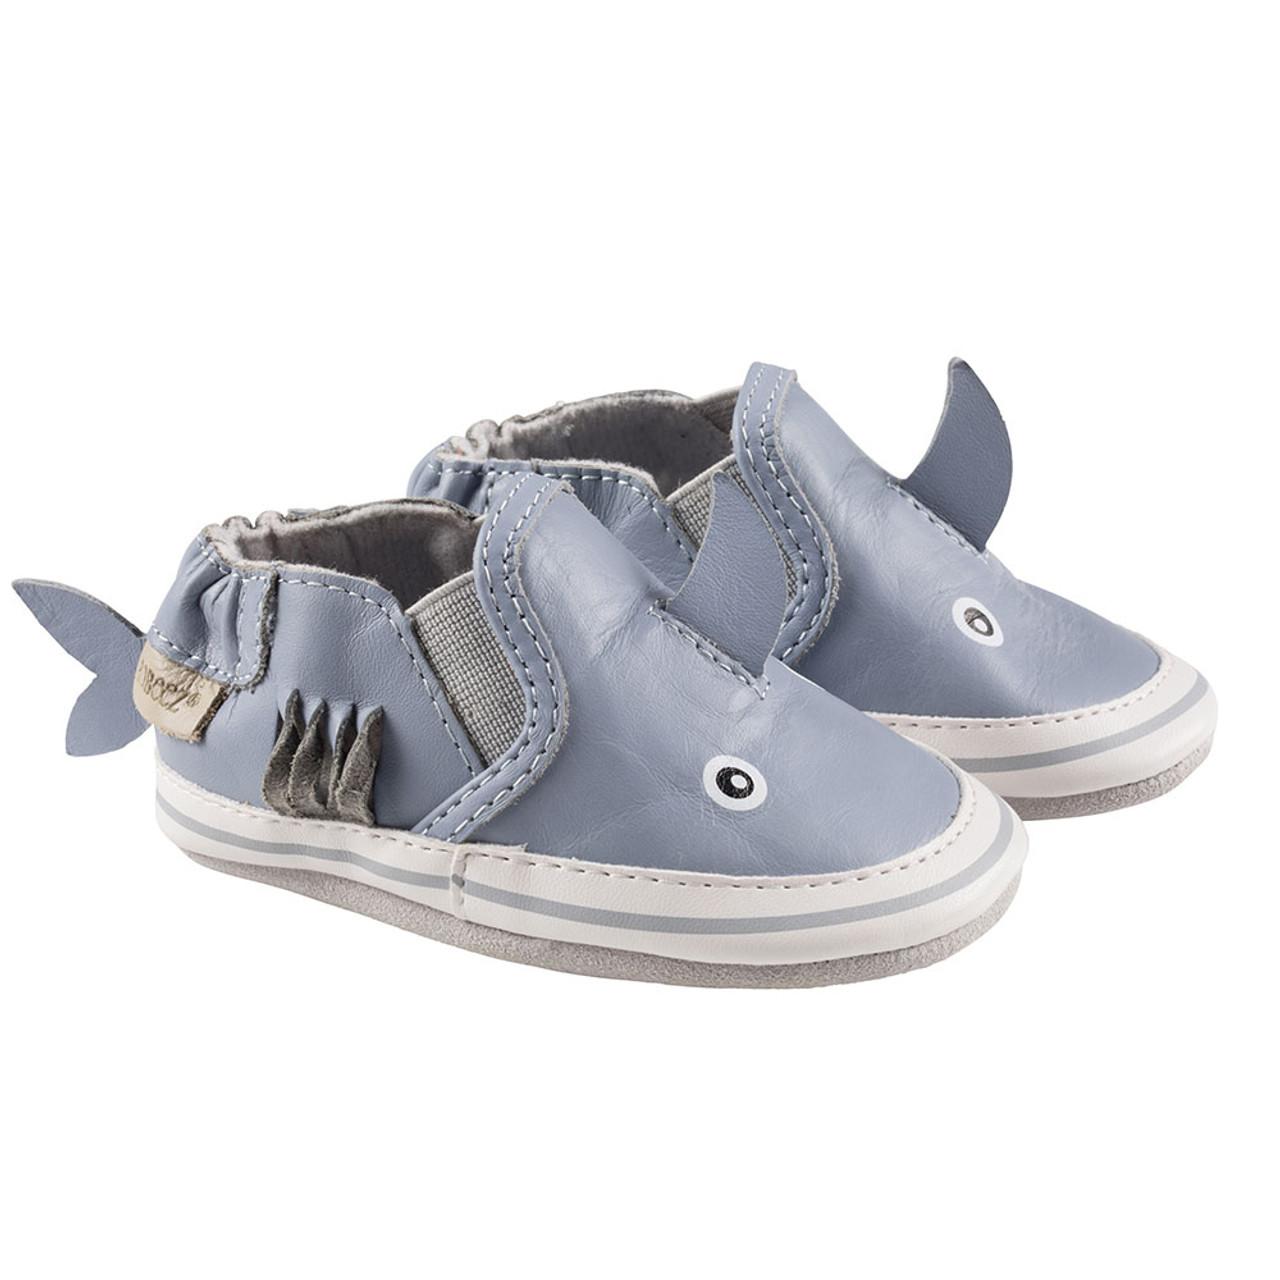 Blue Sebastian Shark | Soft Soles